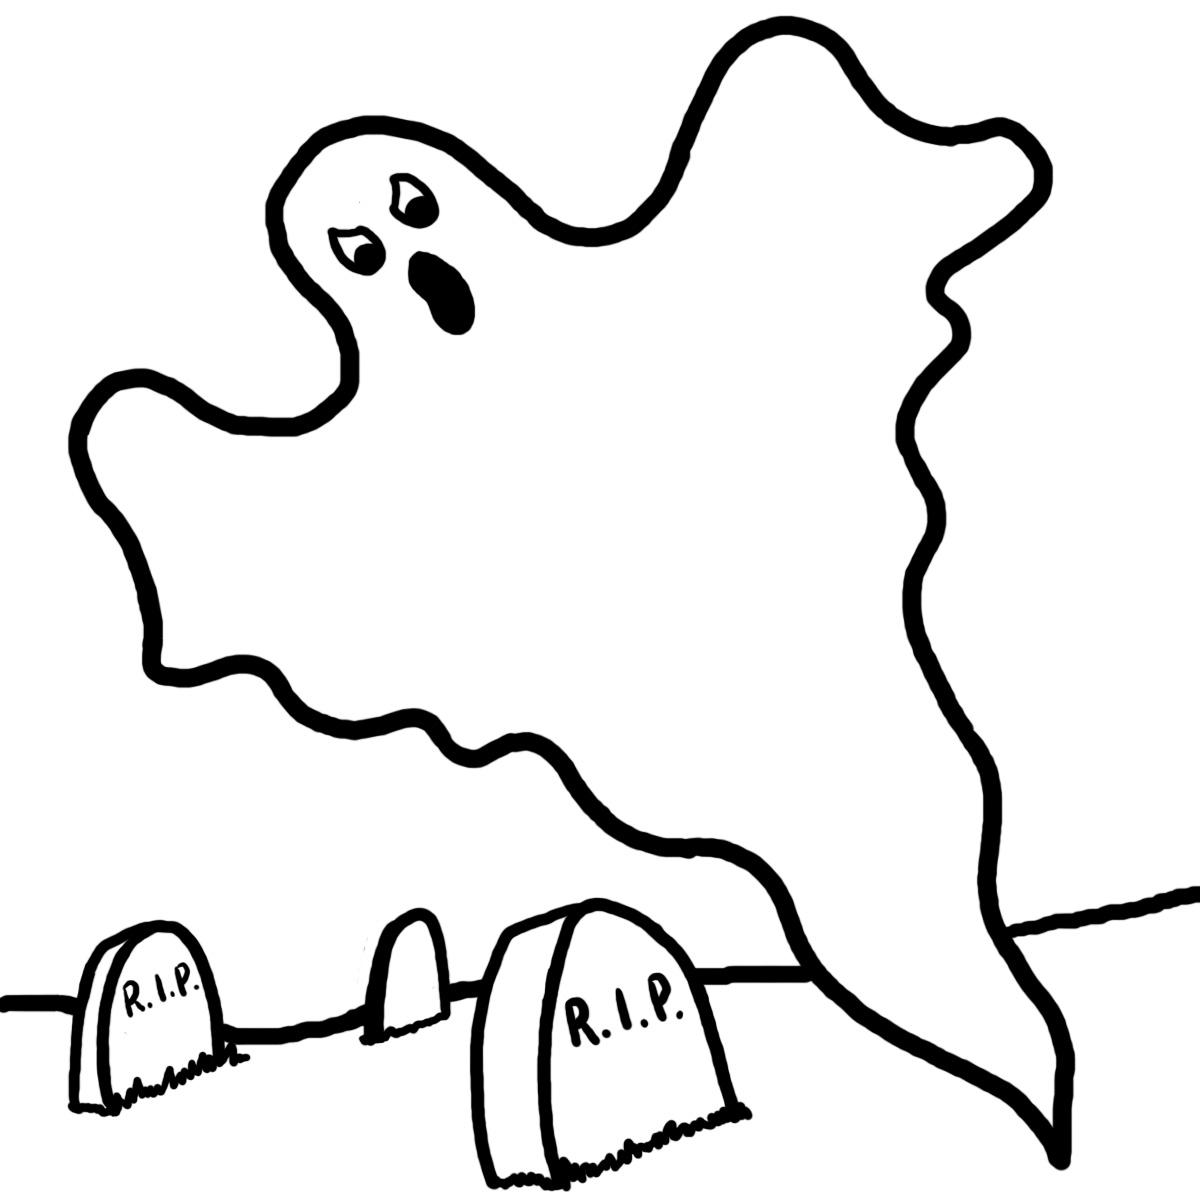 ... Halloween Ghost Clipart #1 - Clip Ar-... Halloween Ghost Clipart #1 - Clip Art Pin ...-13